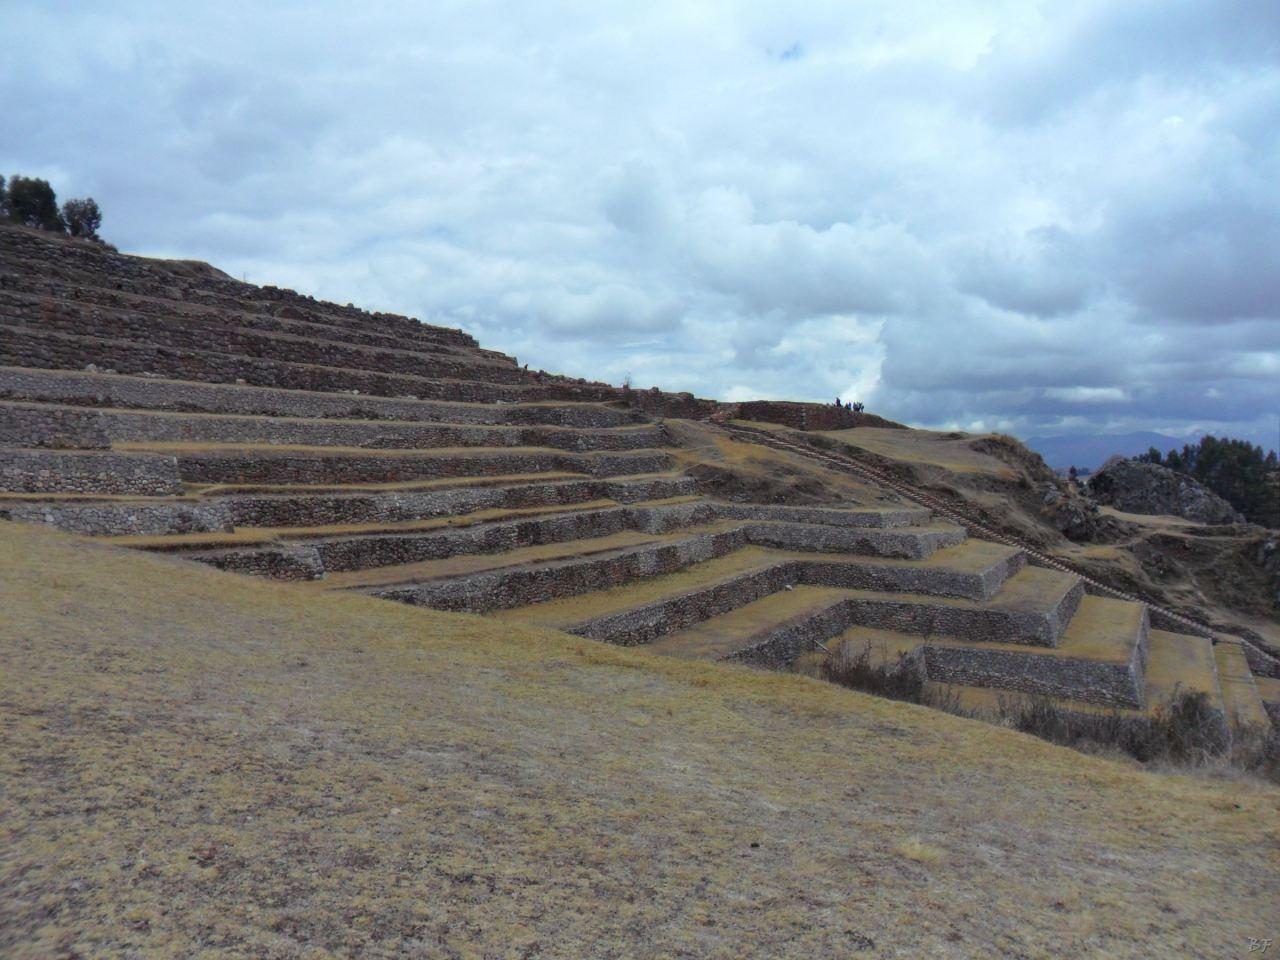 Chinchero-Mura-Poligonali-Piramide-Urubamba-Peru-81